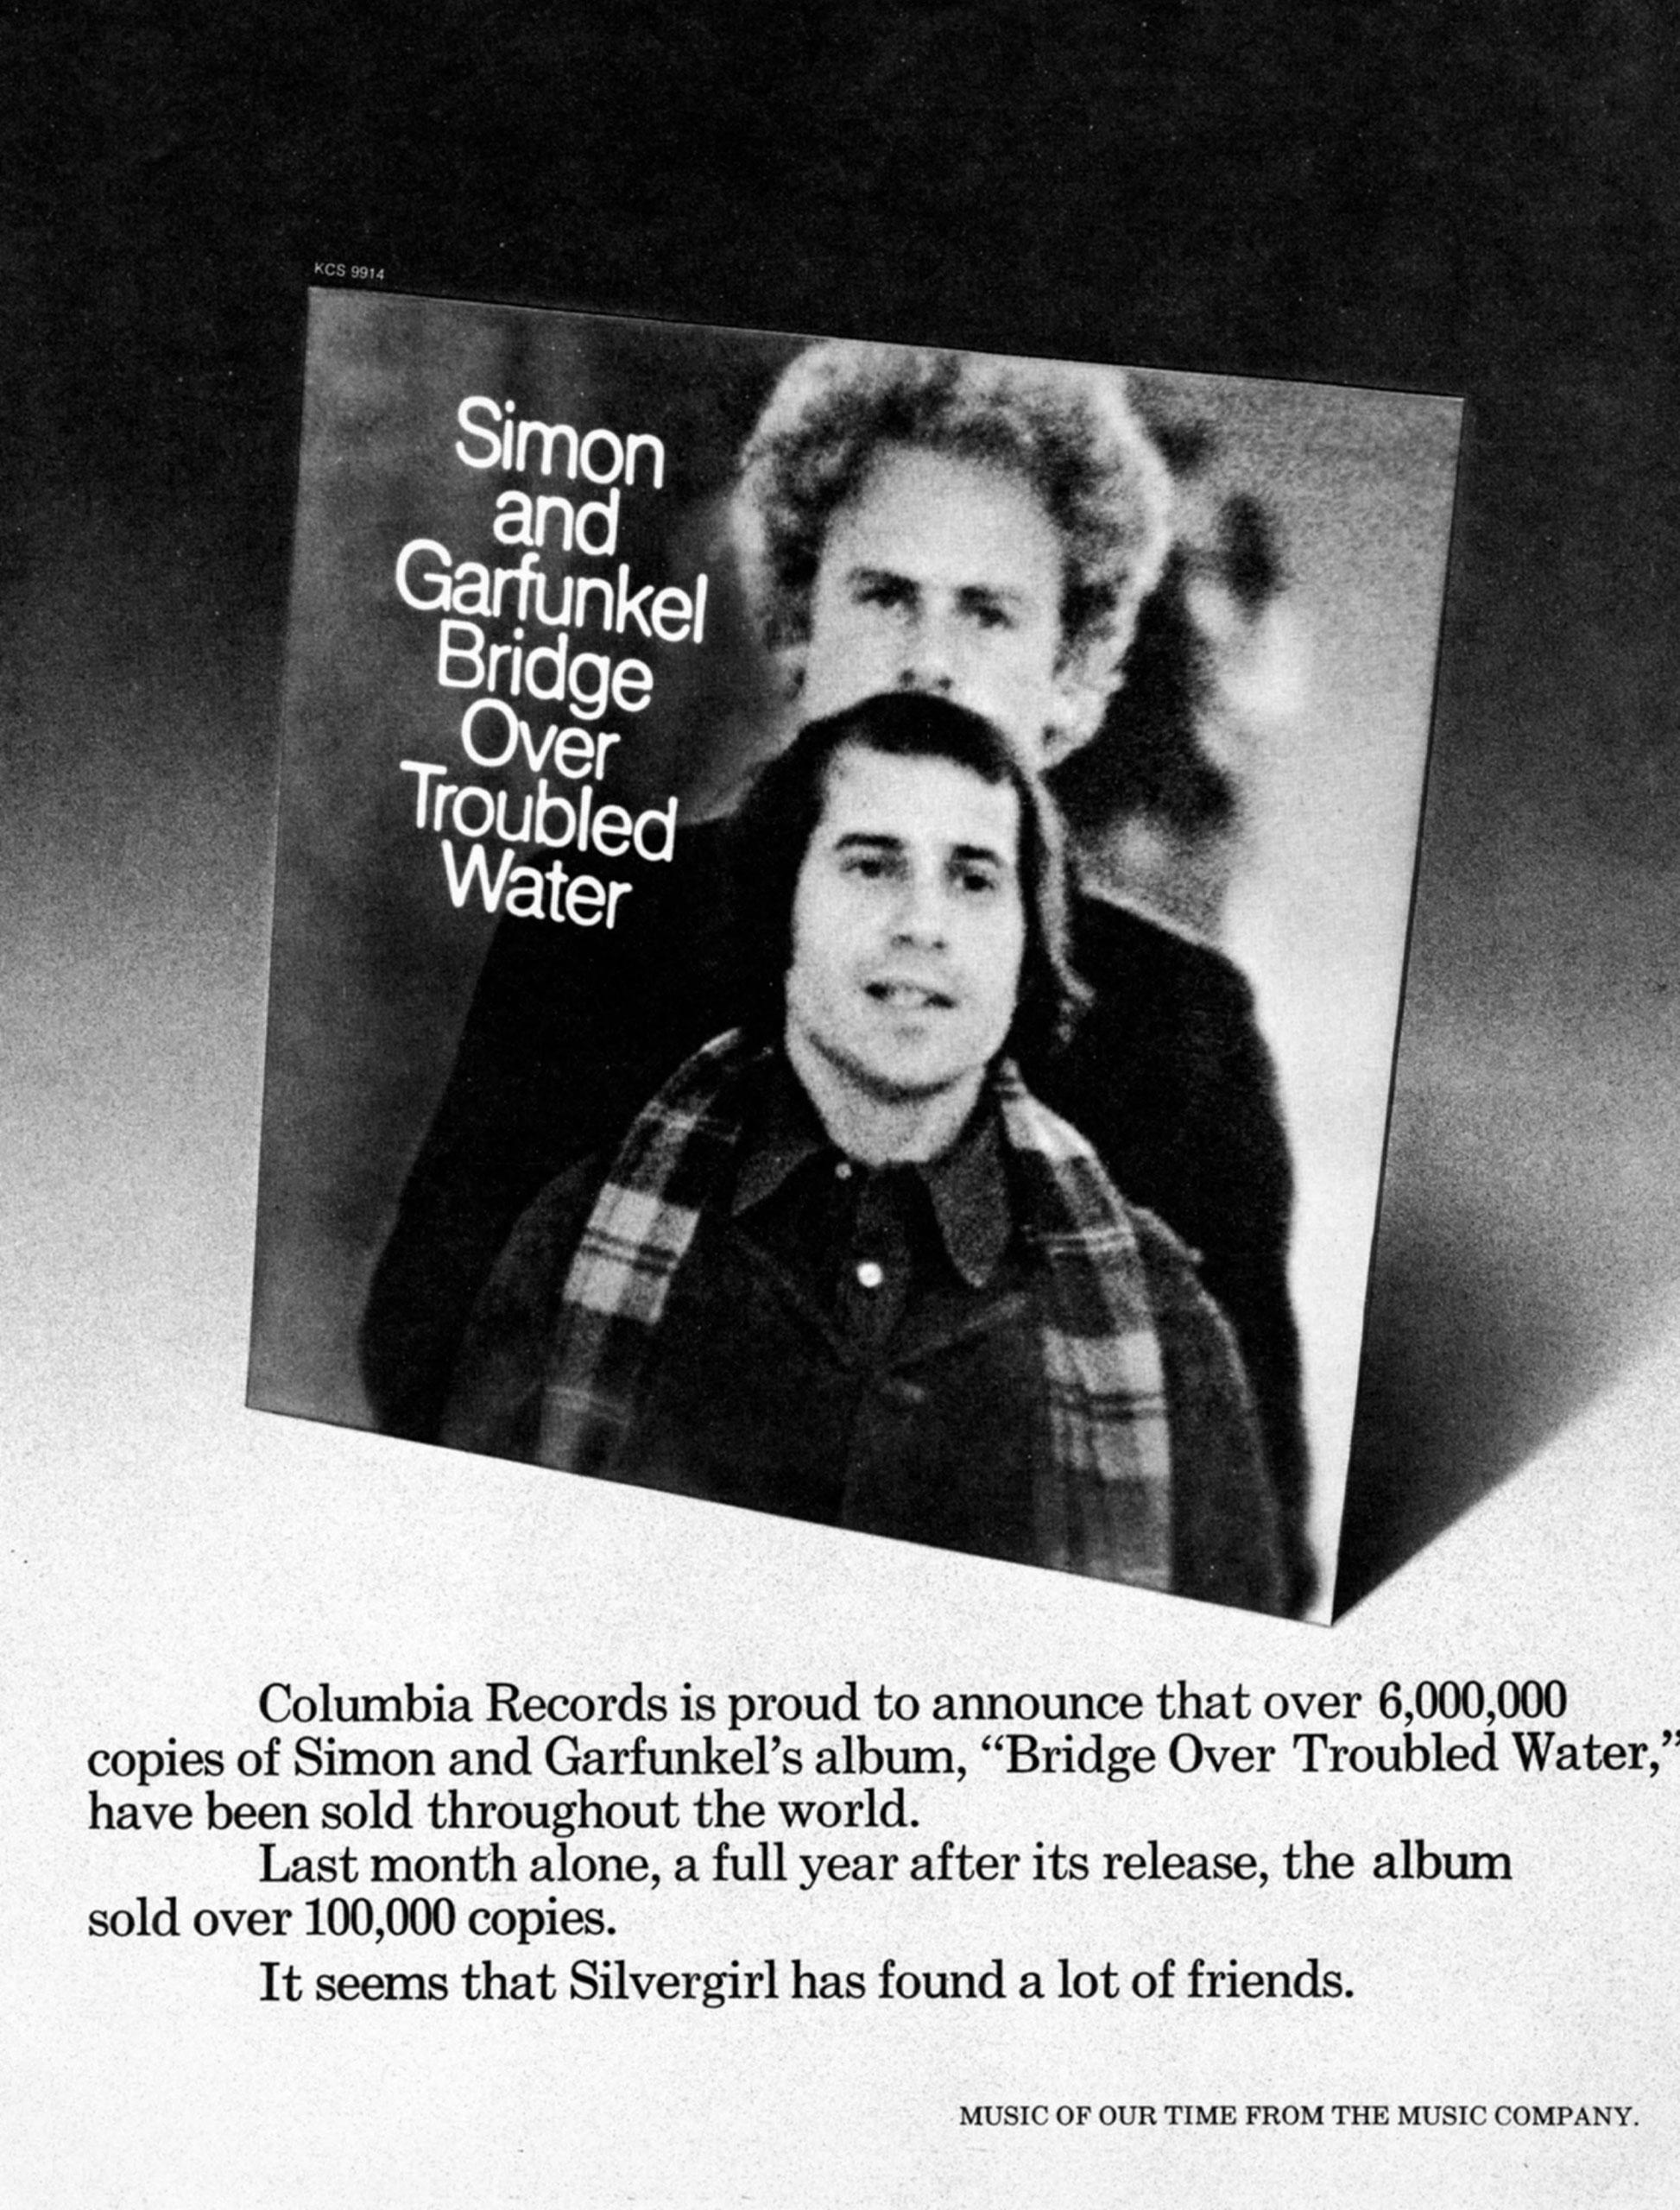 Advertisement for Simon & Garfunkel's album Bridge Over Troubled Water.